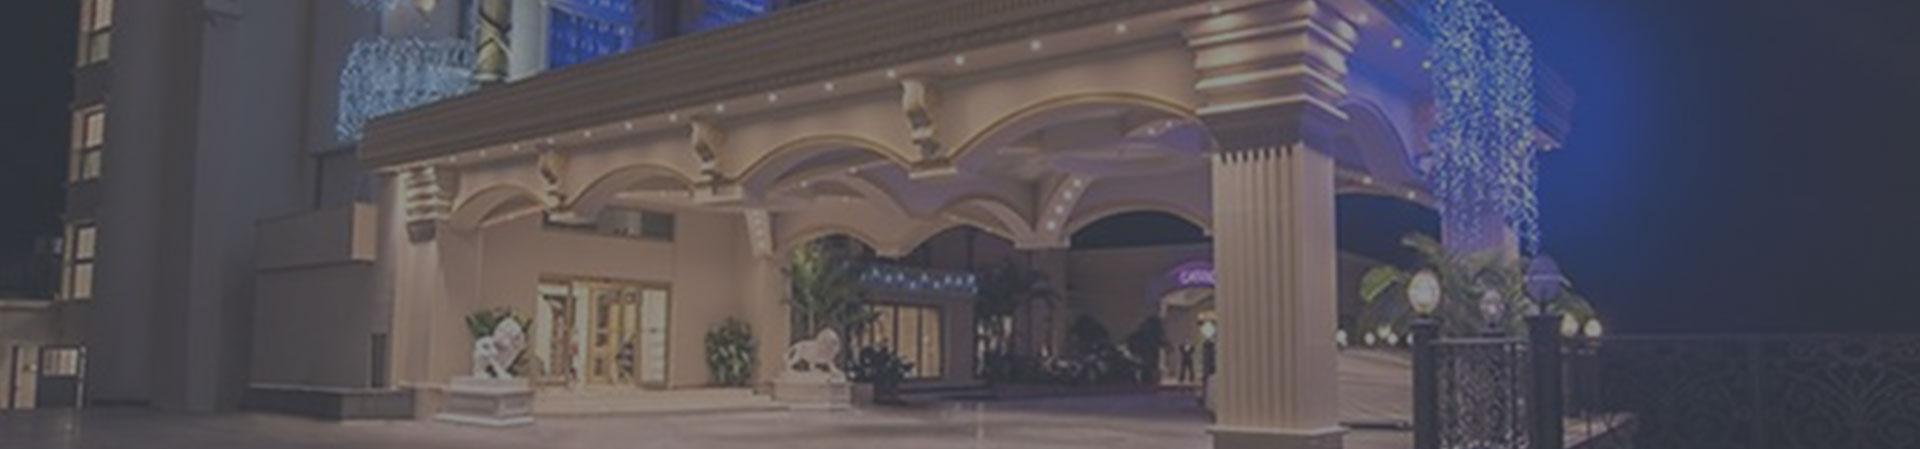 Les Ambassaduers Hotel & Casino